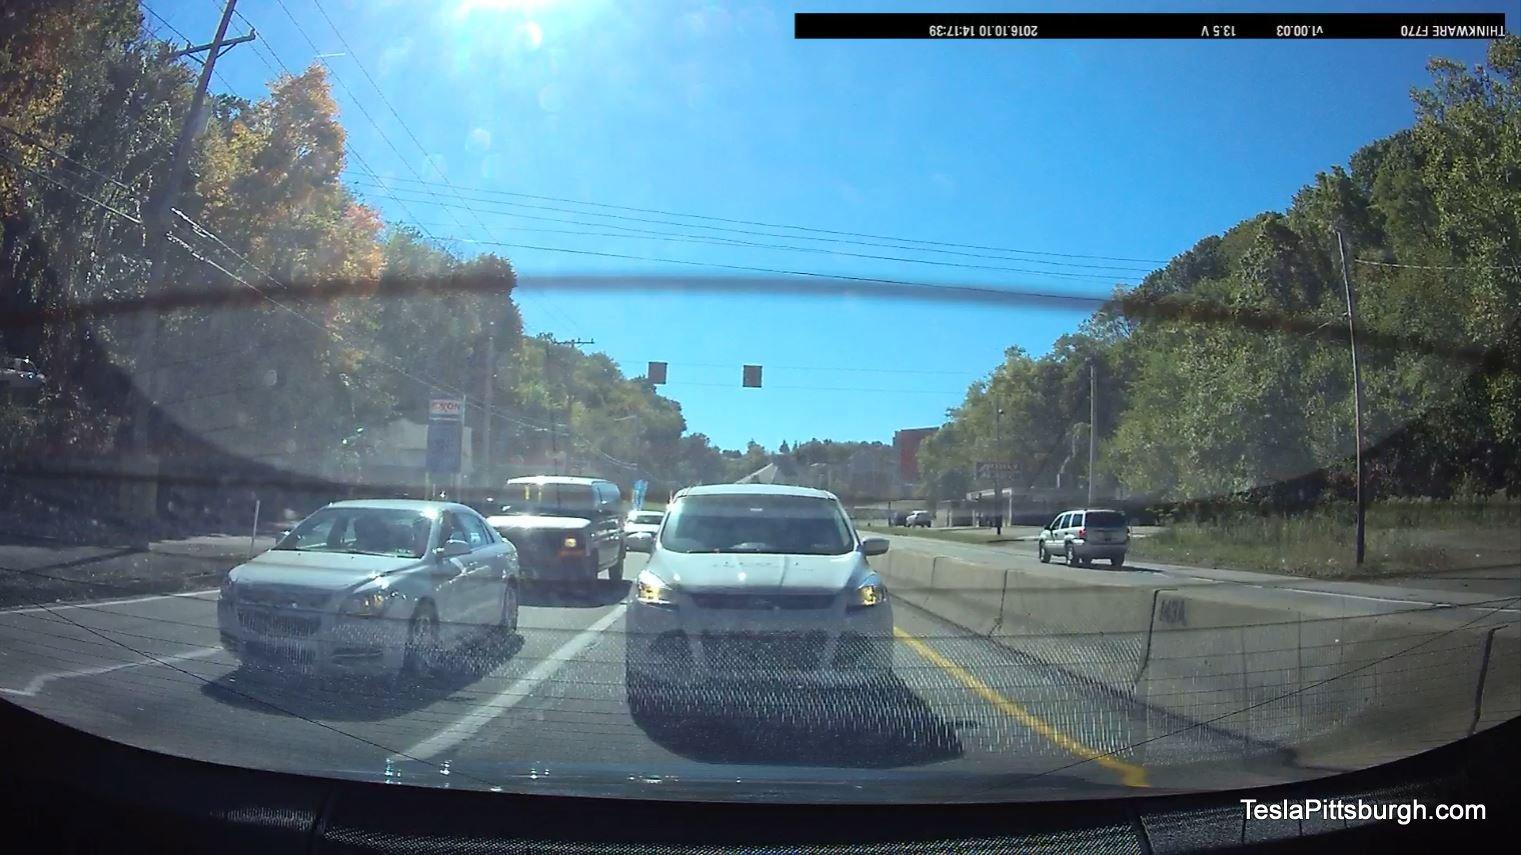 tesla-pittsburgh-dashcam-review-thinkware-f770-camera-daylight-mcknight-1-rear